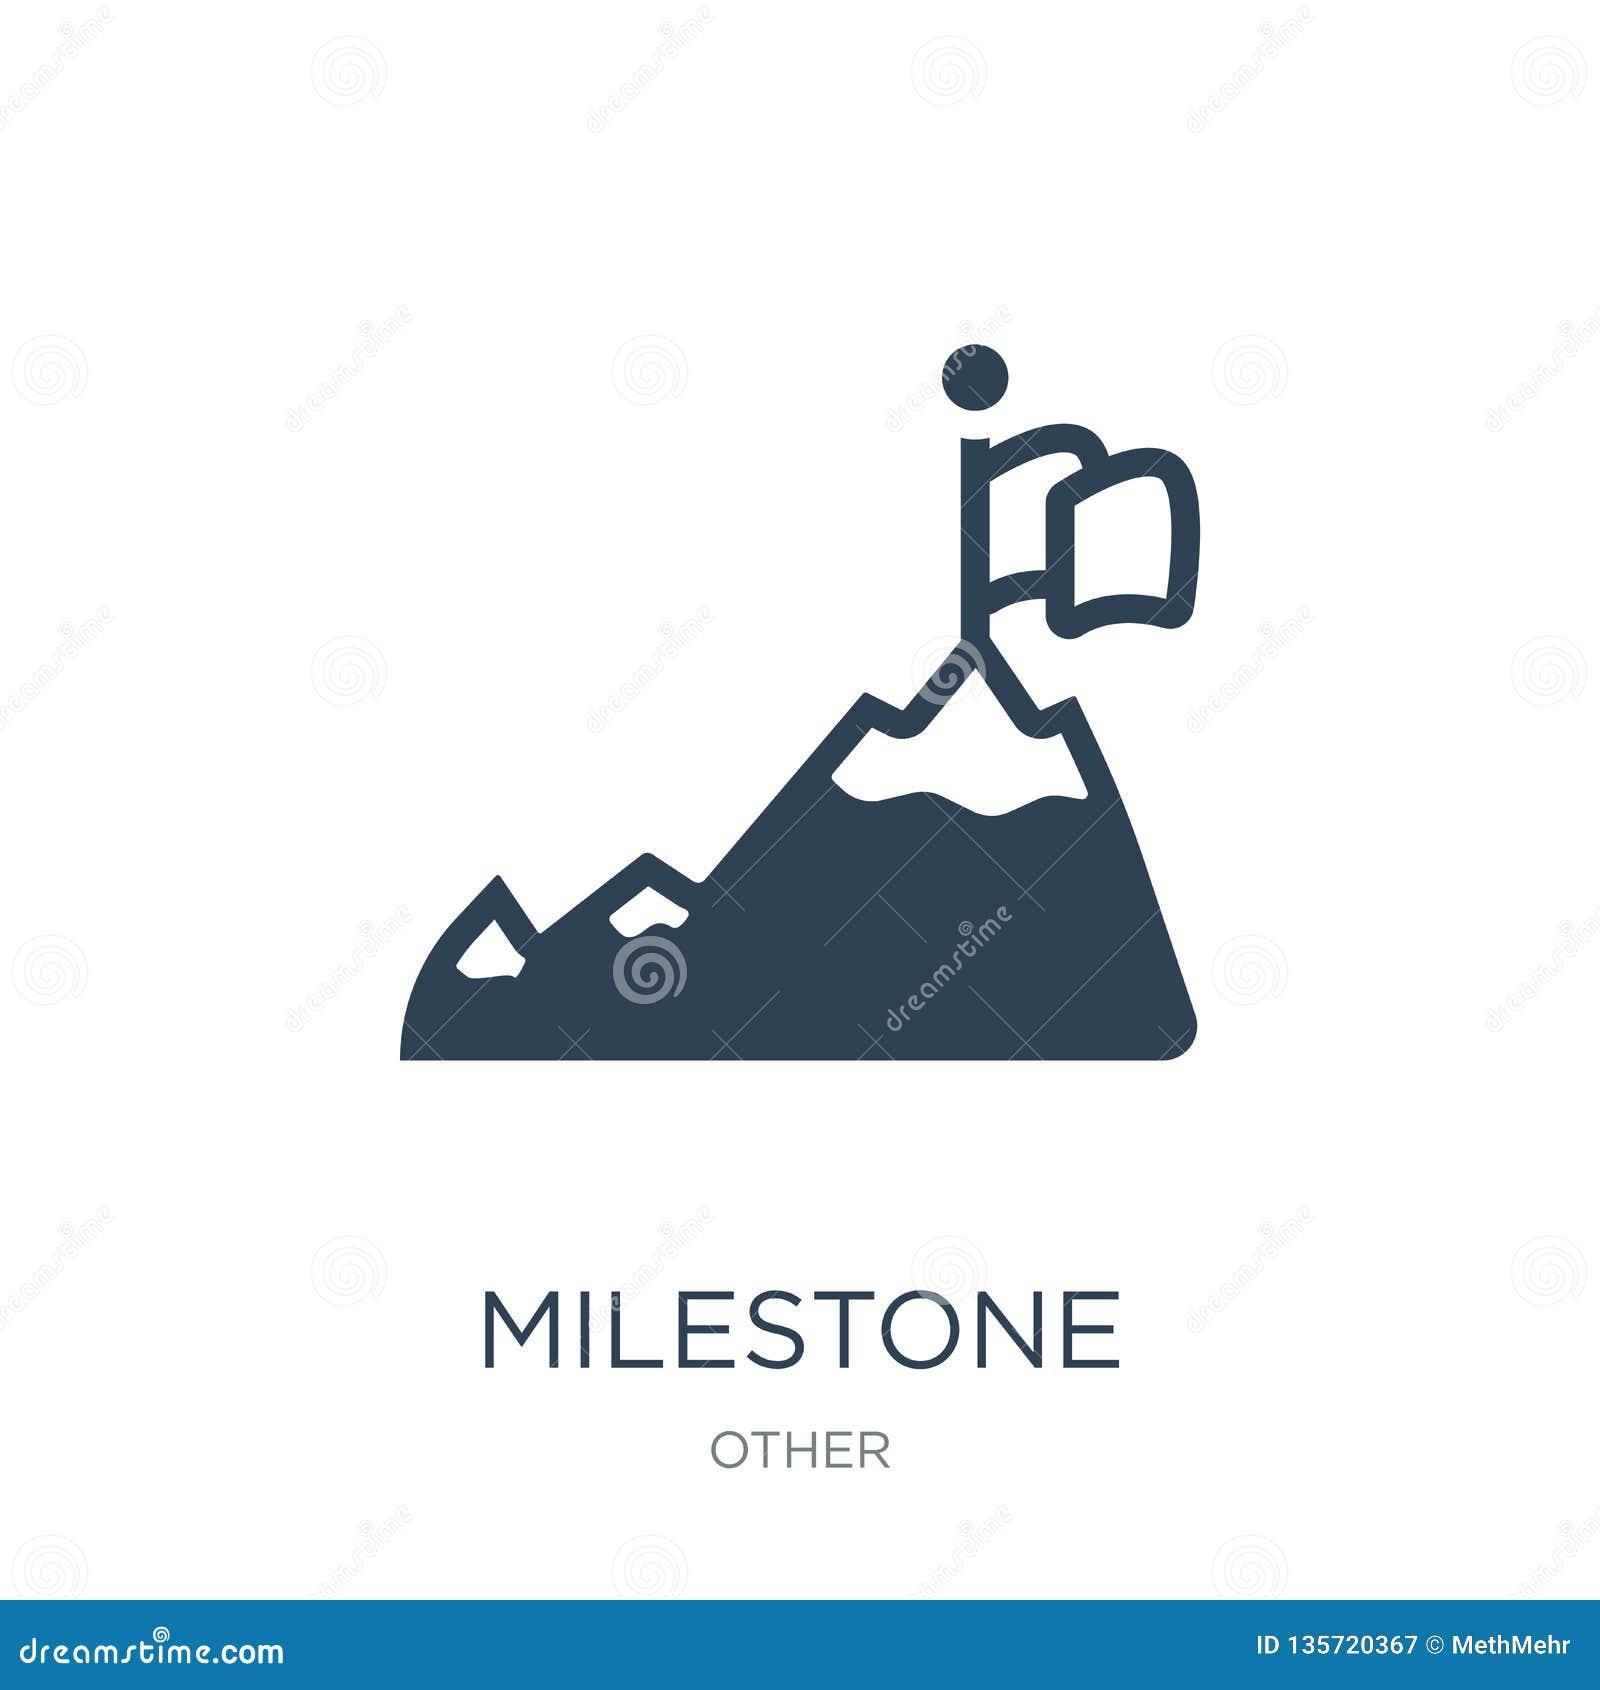 milestone icon in trendy design style. milestone icon isolated on white background. milestone vector icon simple and modern flat